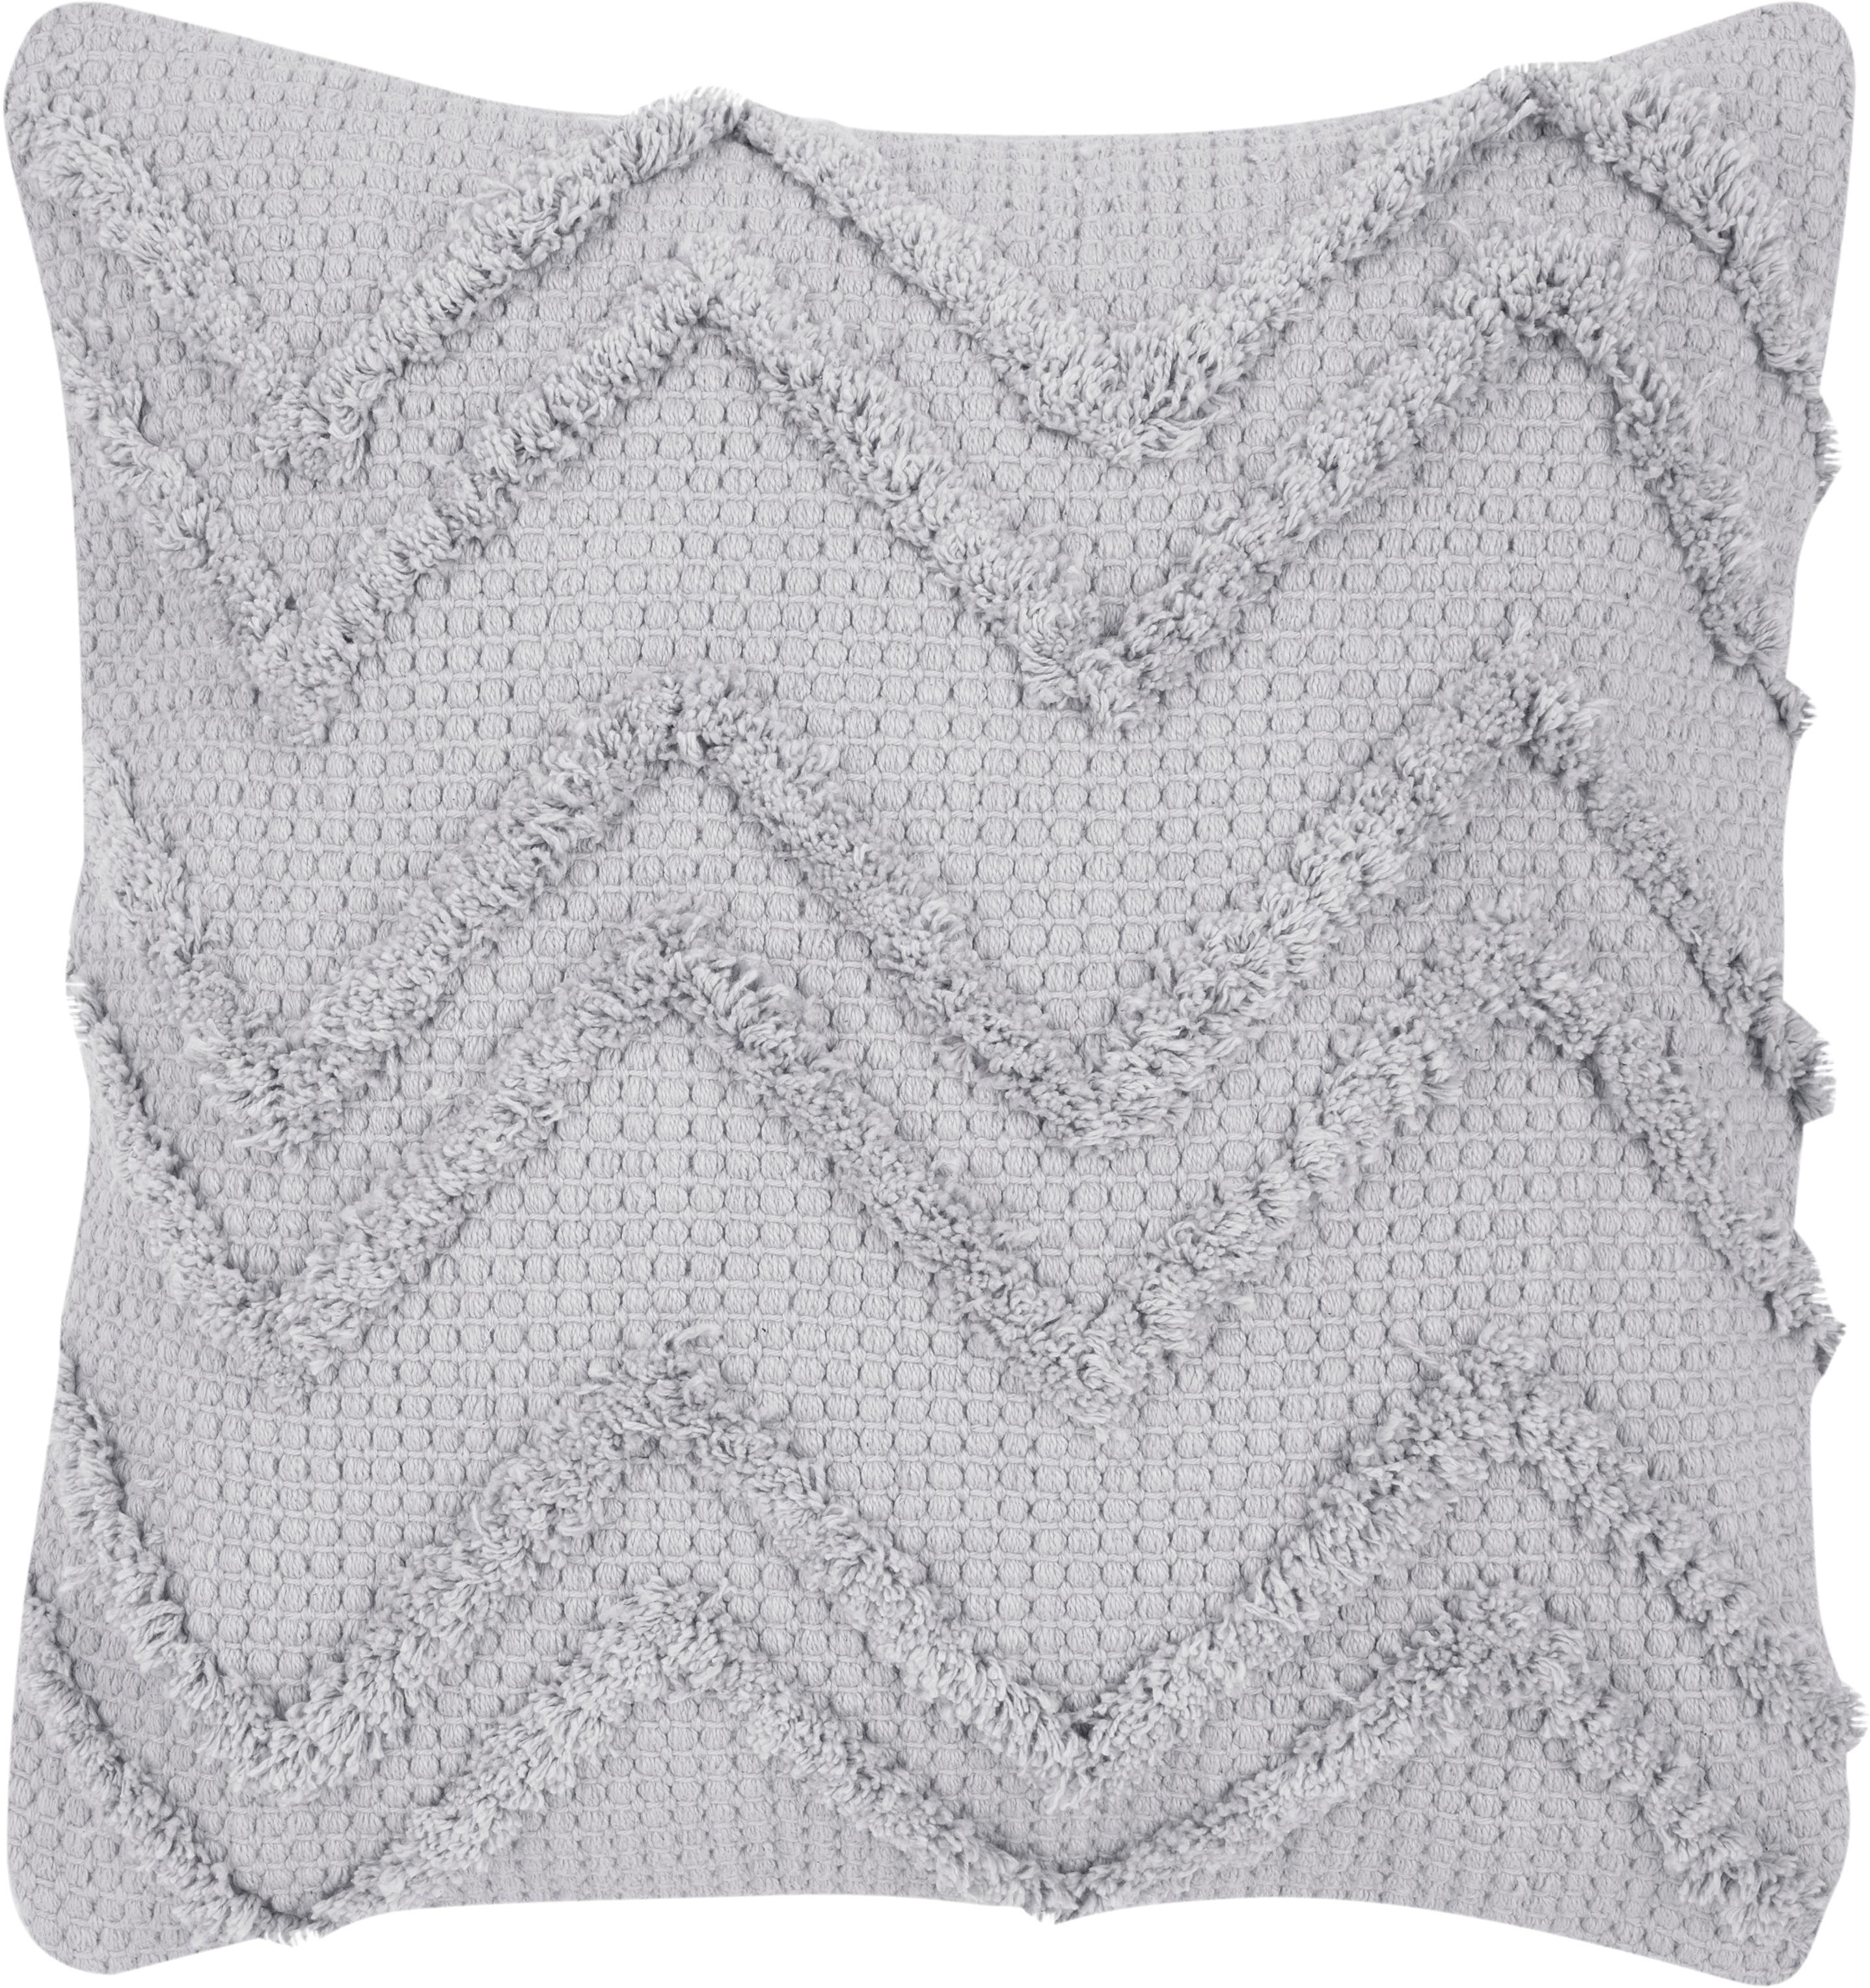 Kissenhülle Akesha mit Zickzack-Muster, 100% Baumwolle, Grau, 45 x 45 cm